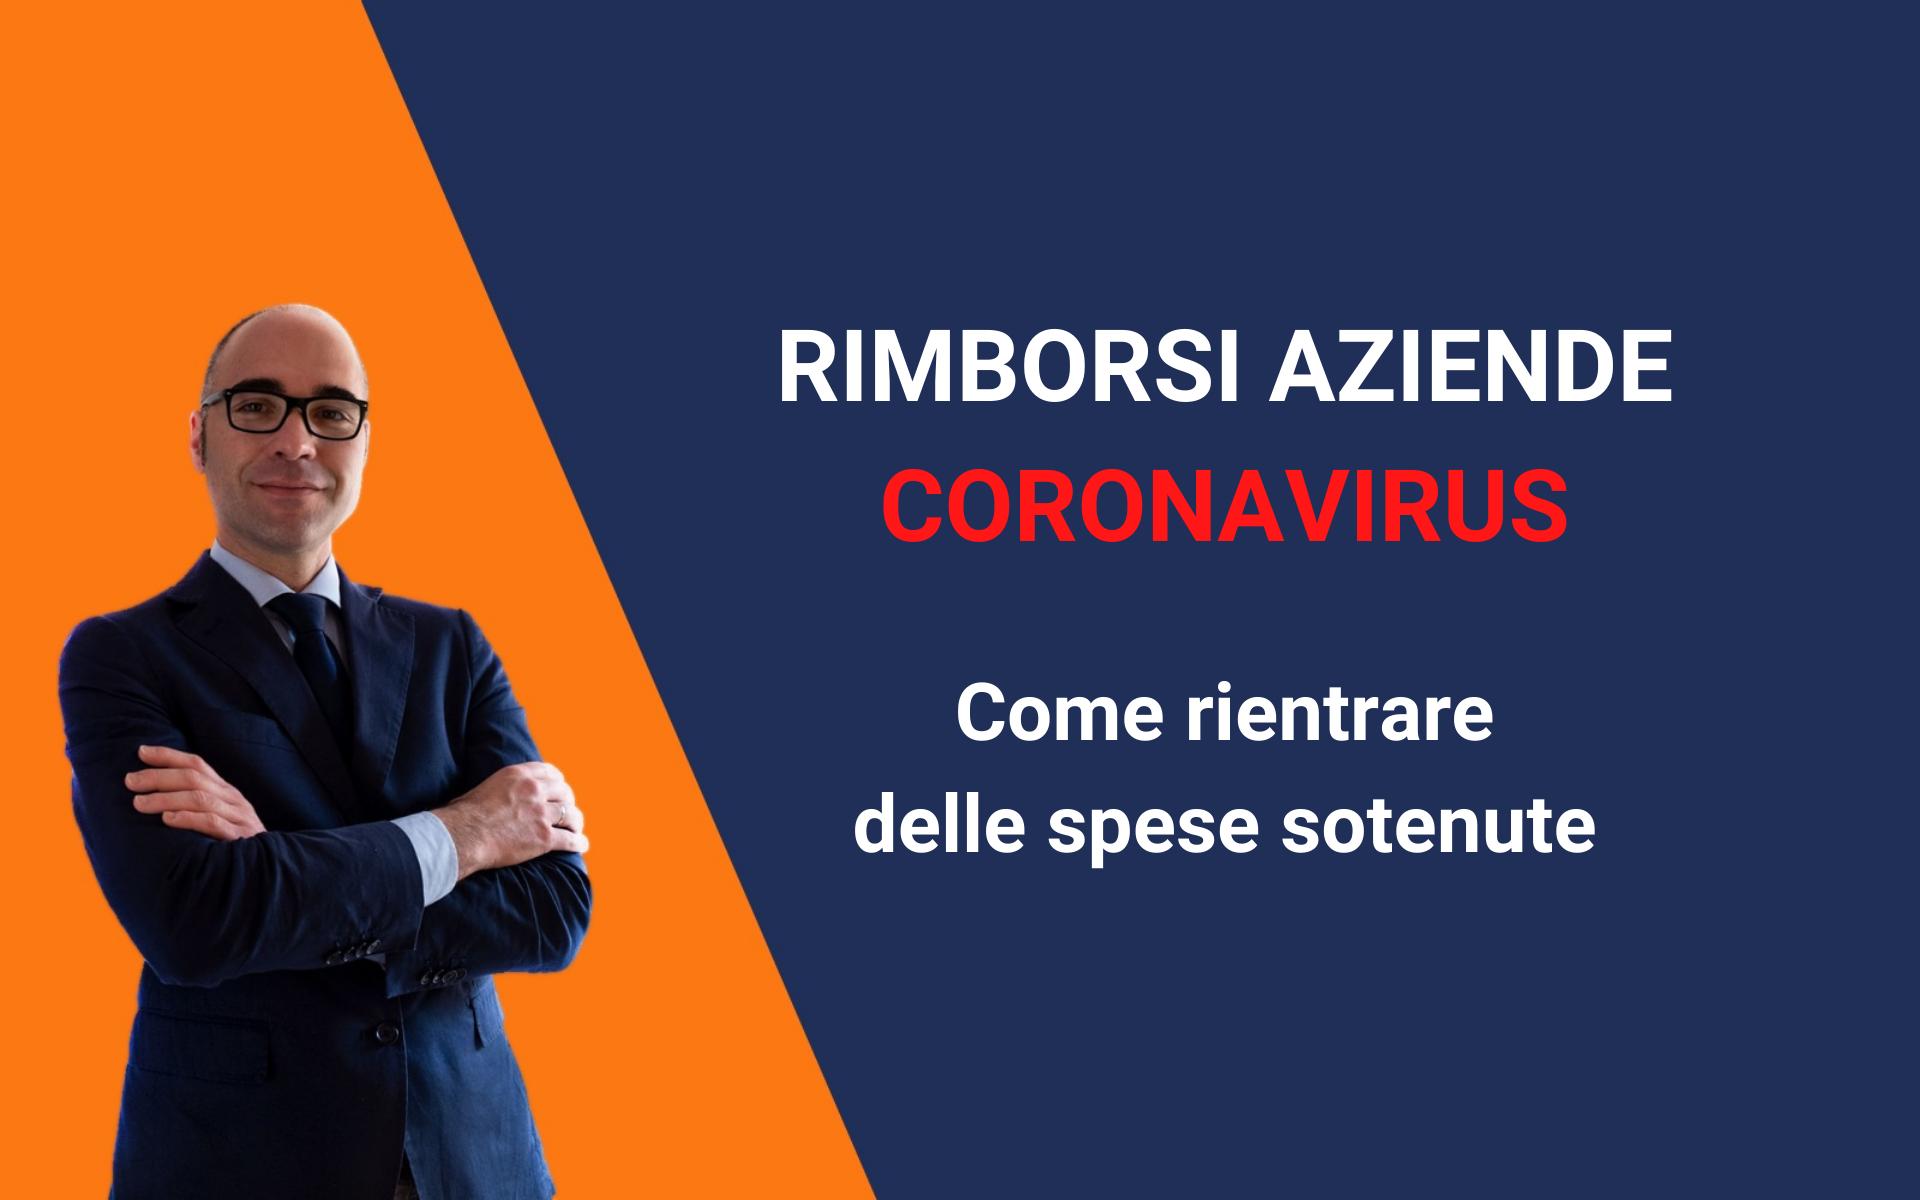 rimborsi aziende coronavirus